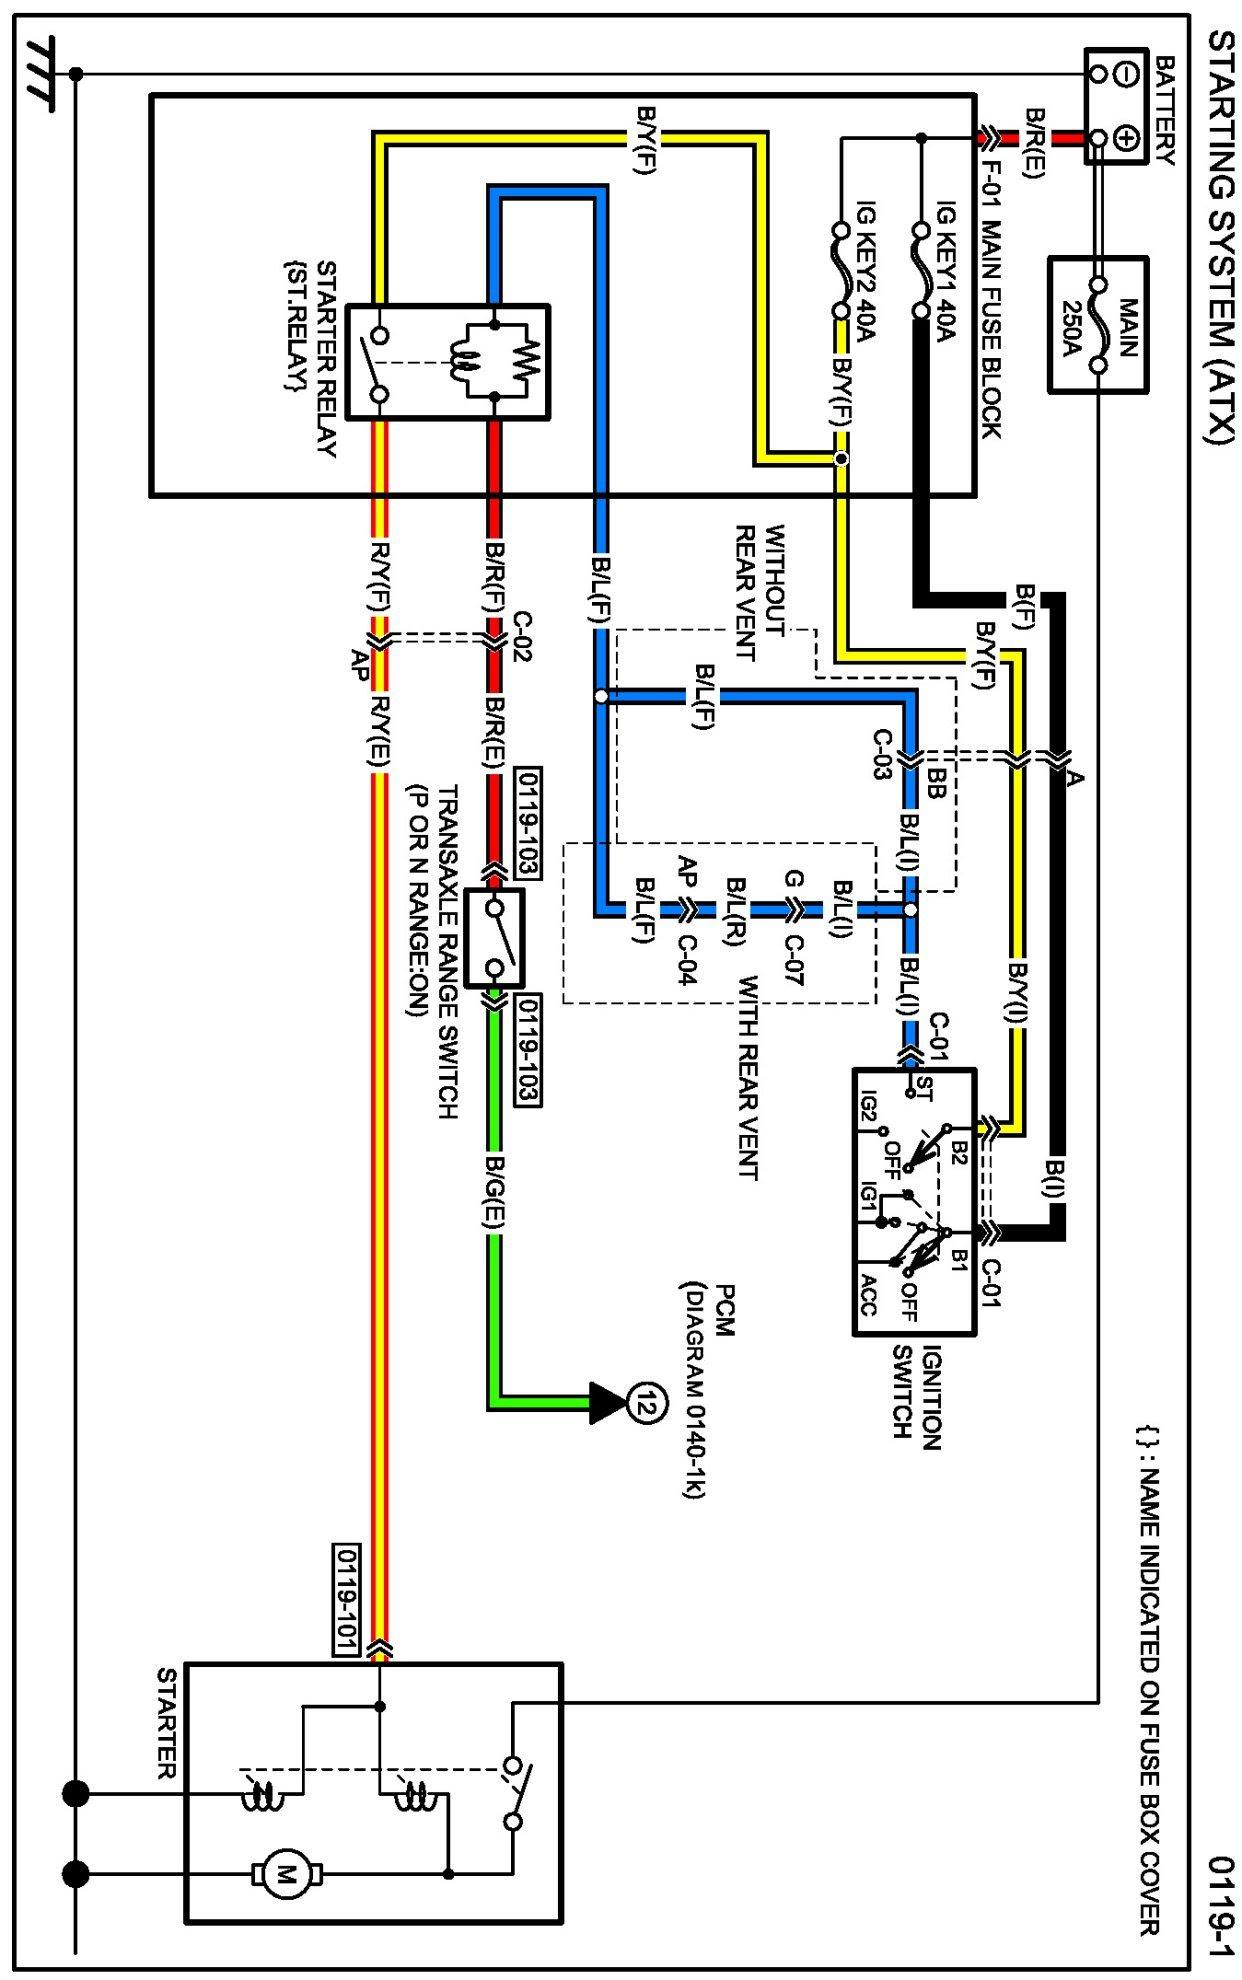 Diagram 2013 Mazda 5 Wiring Diagram Full Version Hd Quality Wiring Diagram 26639 Vincentescrive Fr